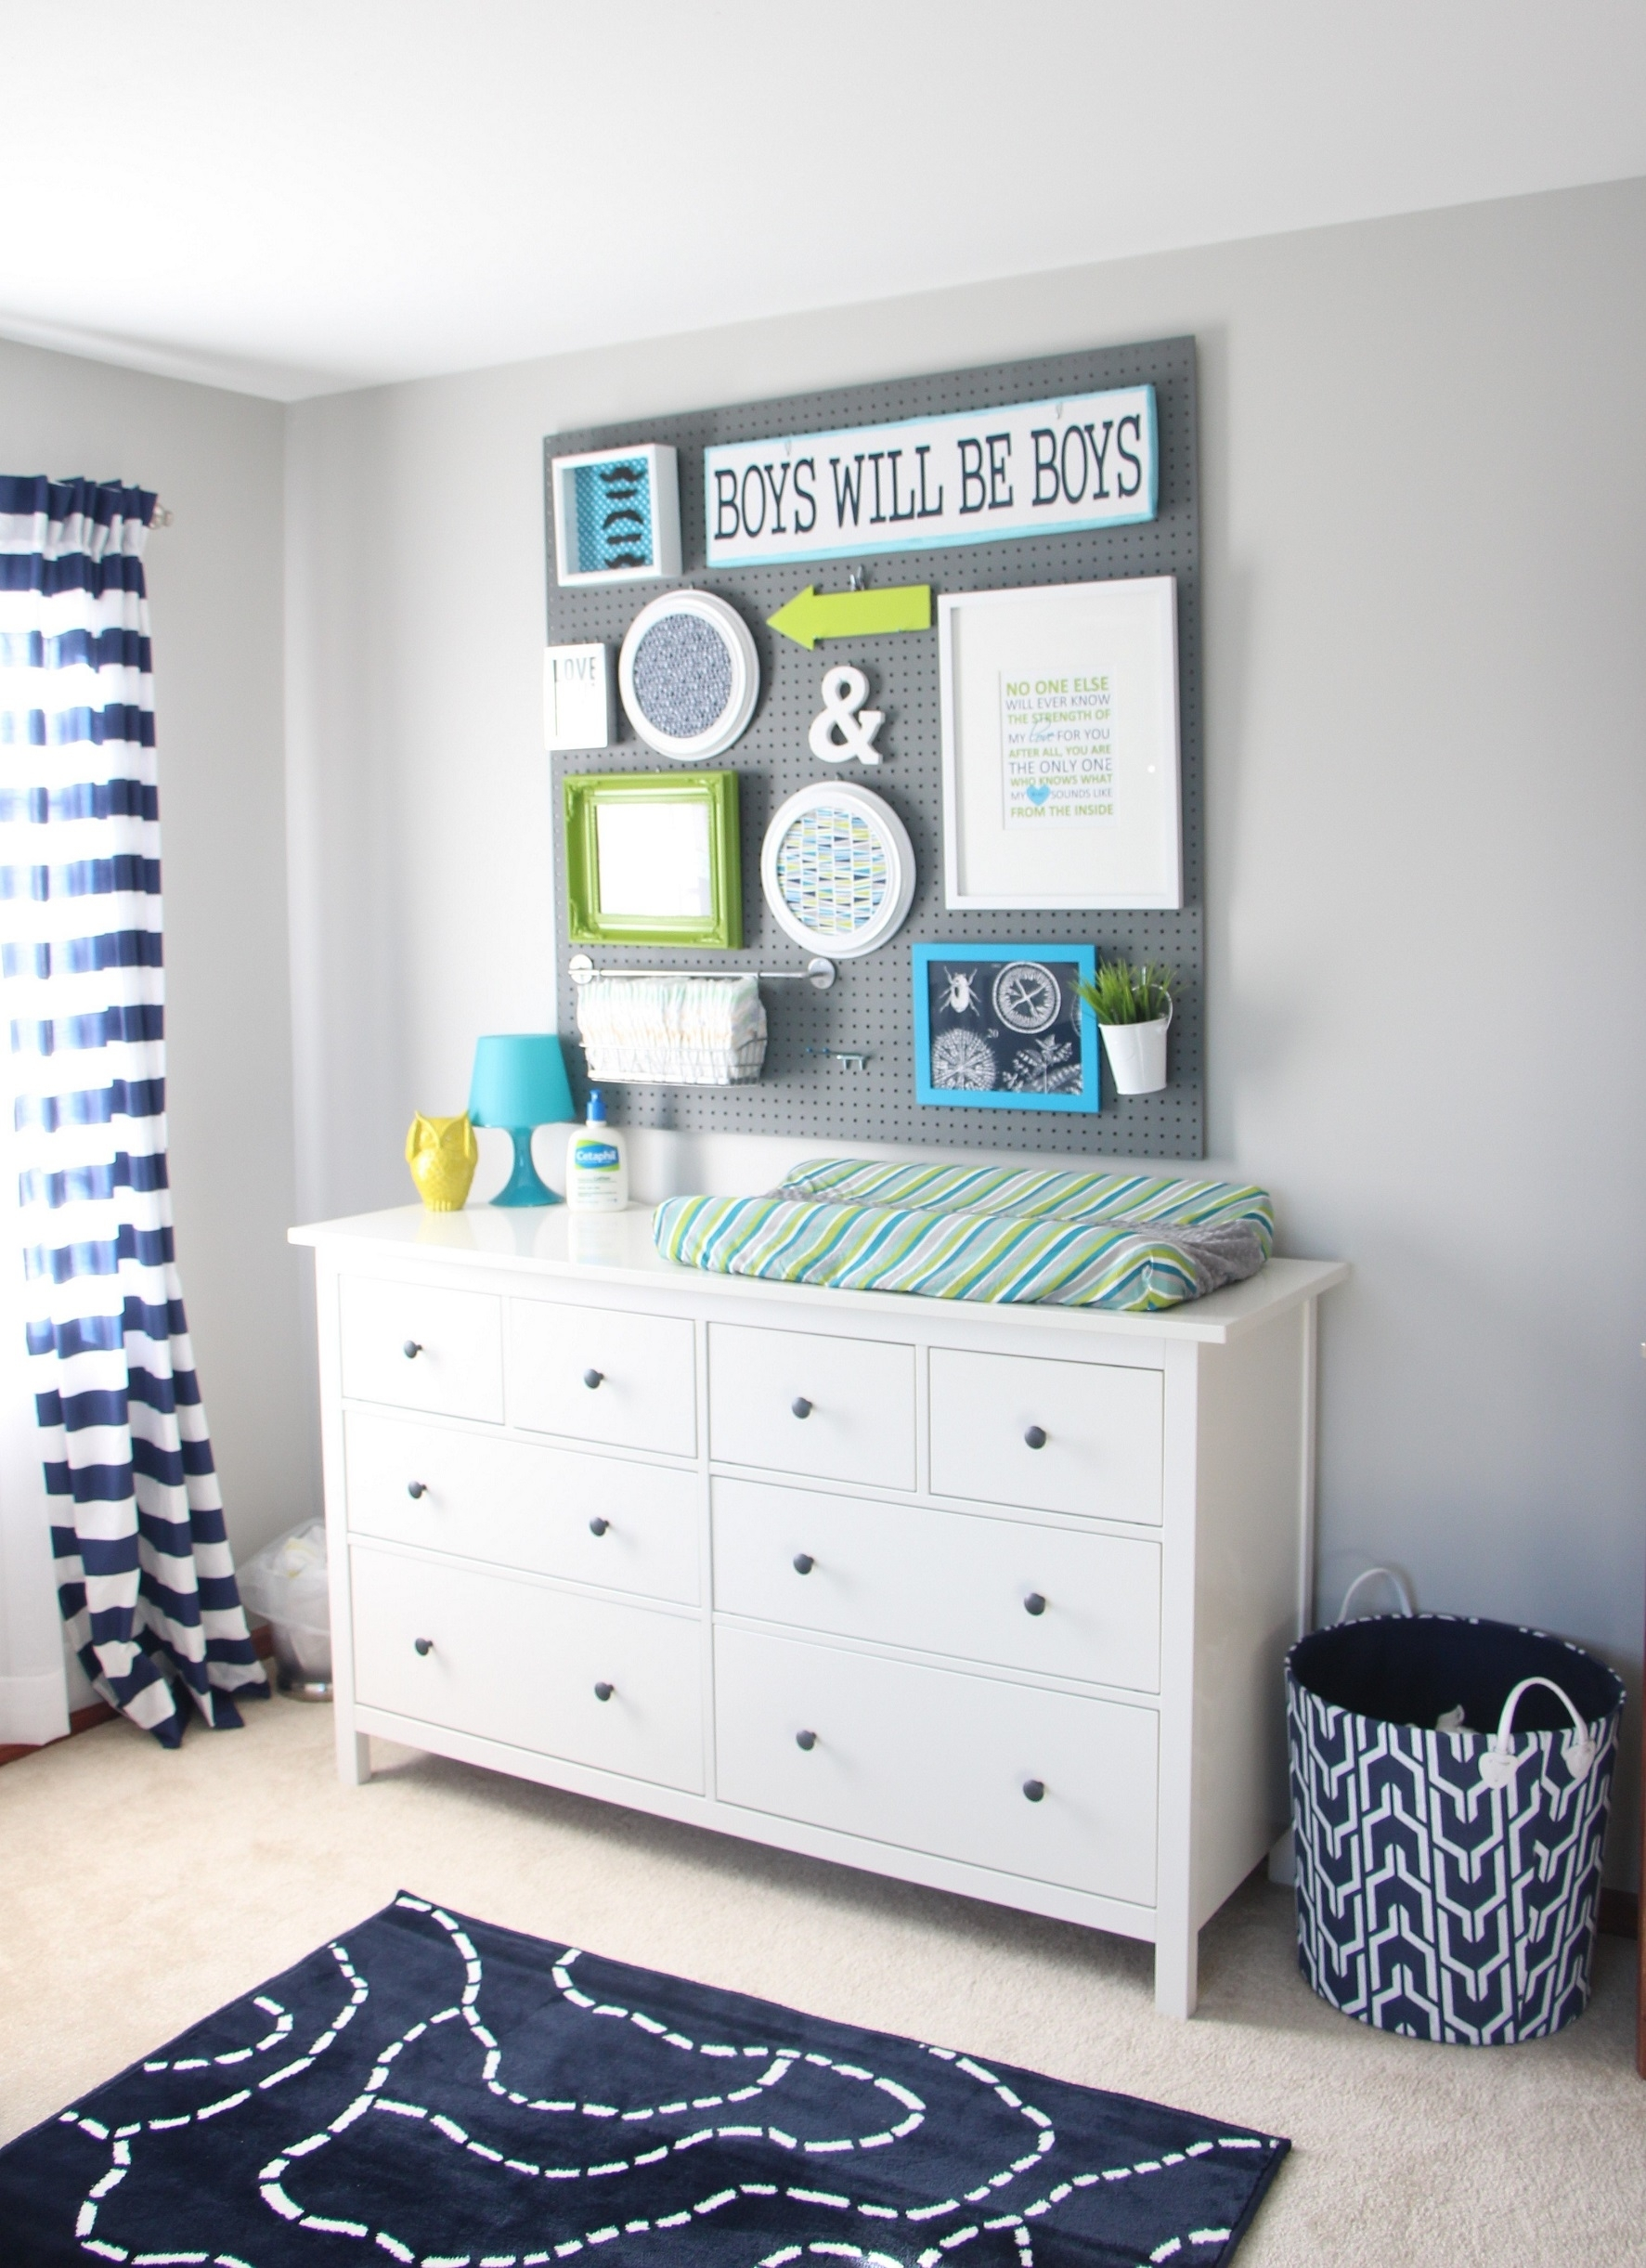 Wall Art Designs: Fabric Wall Art Baby Nursery Navy Nursery Regarding Most Popular Baby Fabric Wall Art (View 6 of 15)